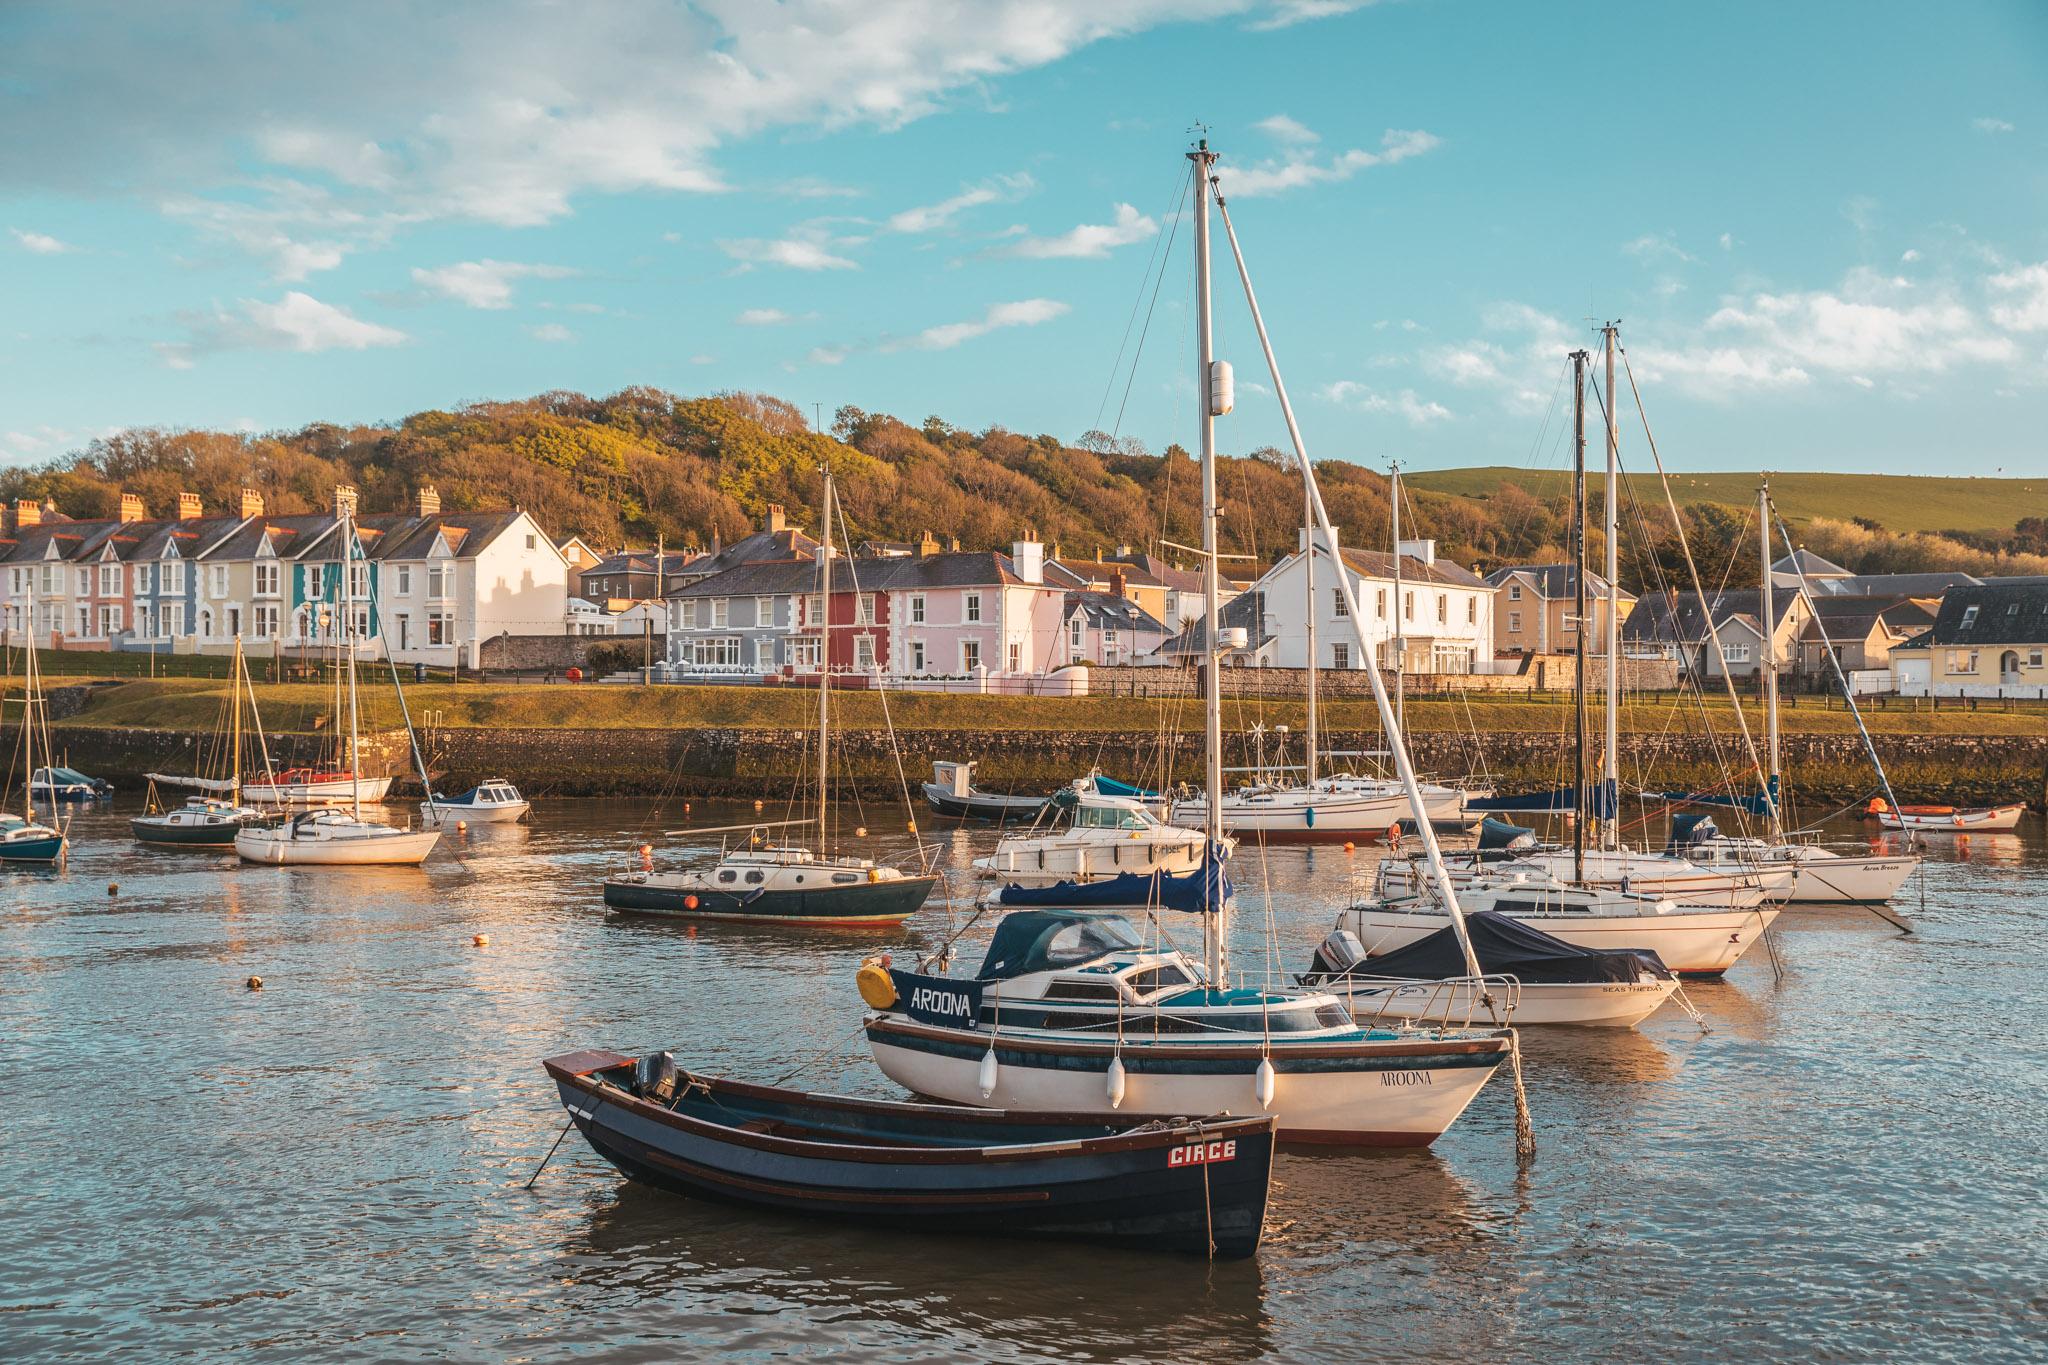 Aberaeron harbour // The Most Beautiful Places to Visit in Wales // #readysetjetset #wales #uk #welsh #travel #photospots #blogpost